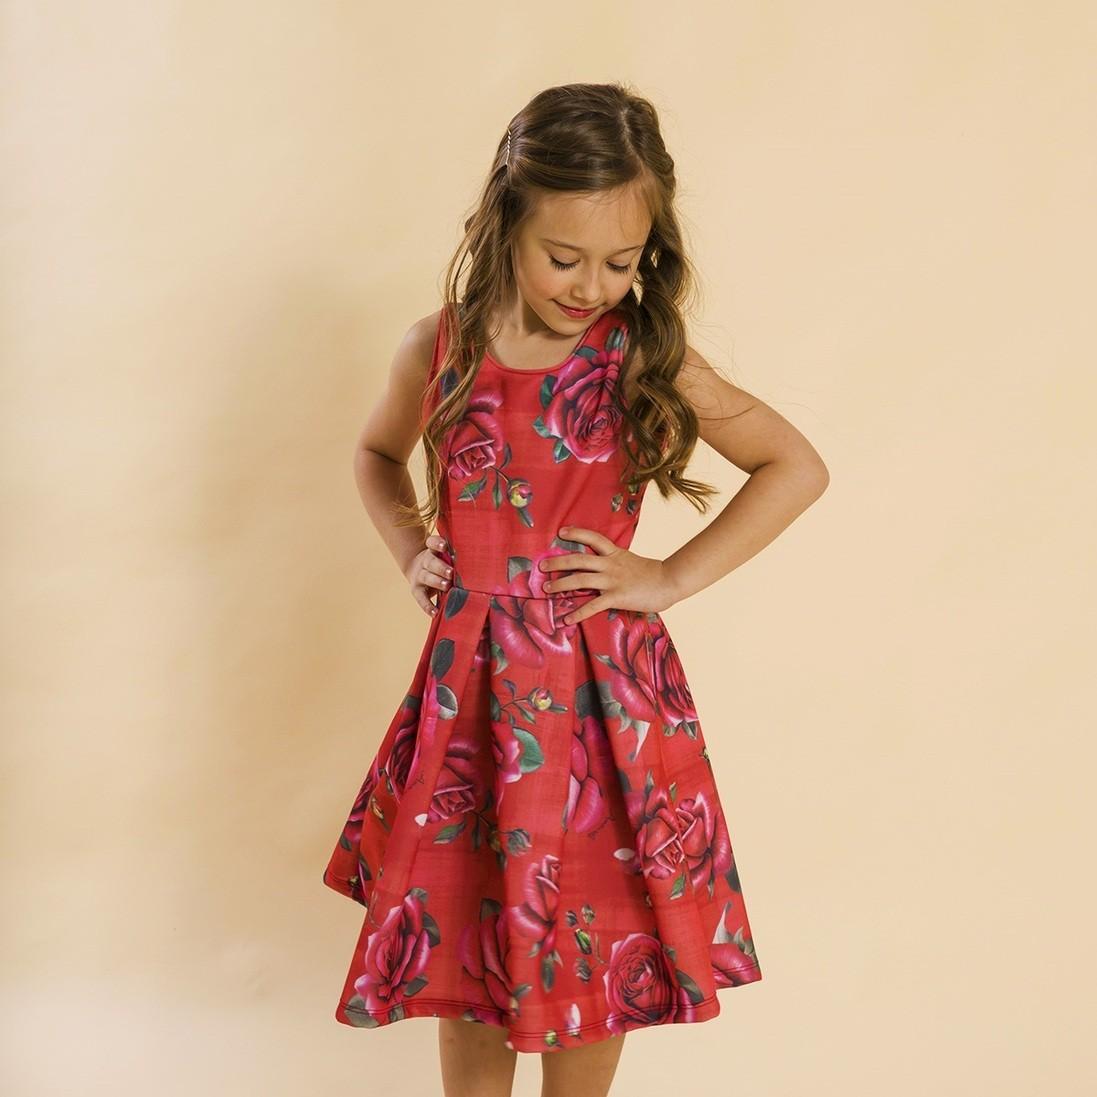 BAZAR - Vestido Infantil Malha Rosas Vermelho